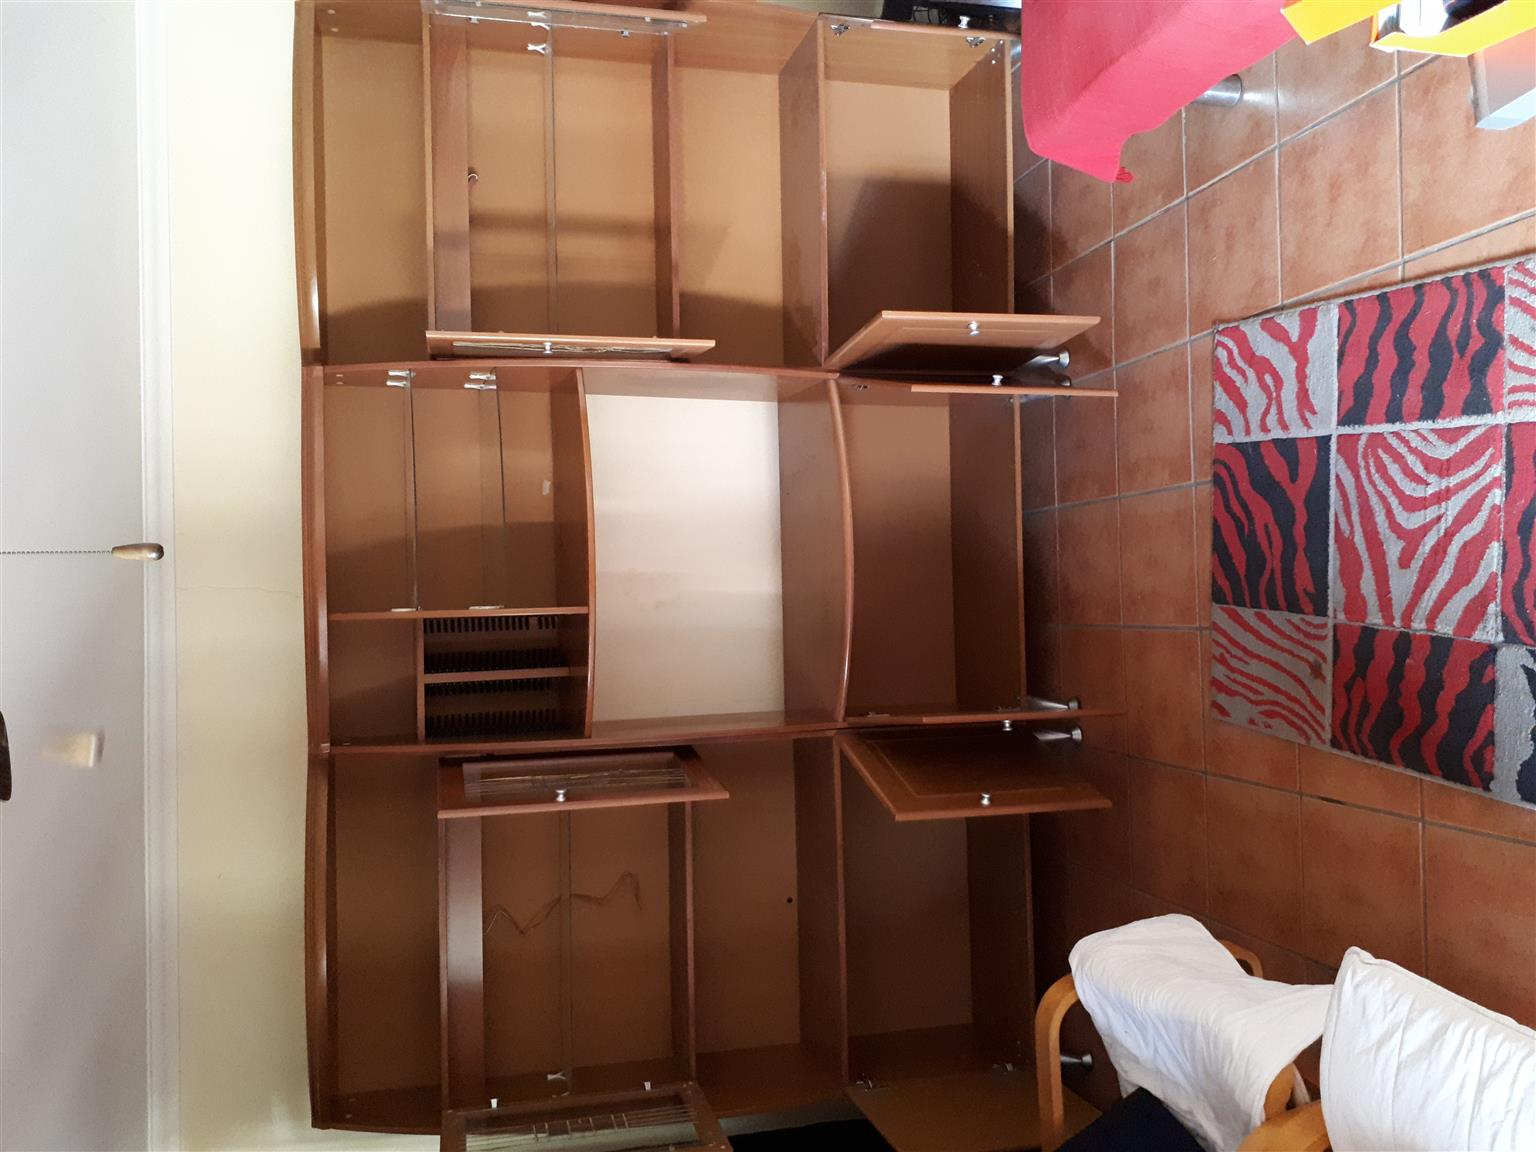 3 Piece Wall Unit | Junk Mail